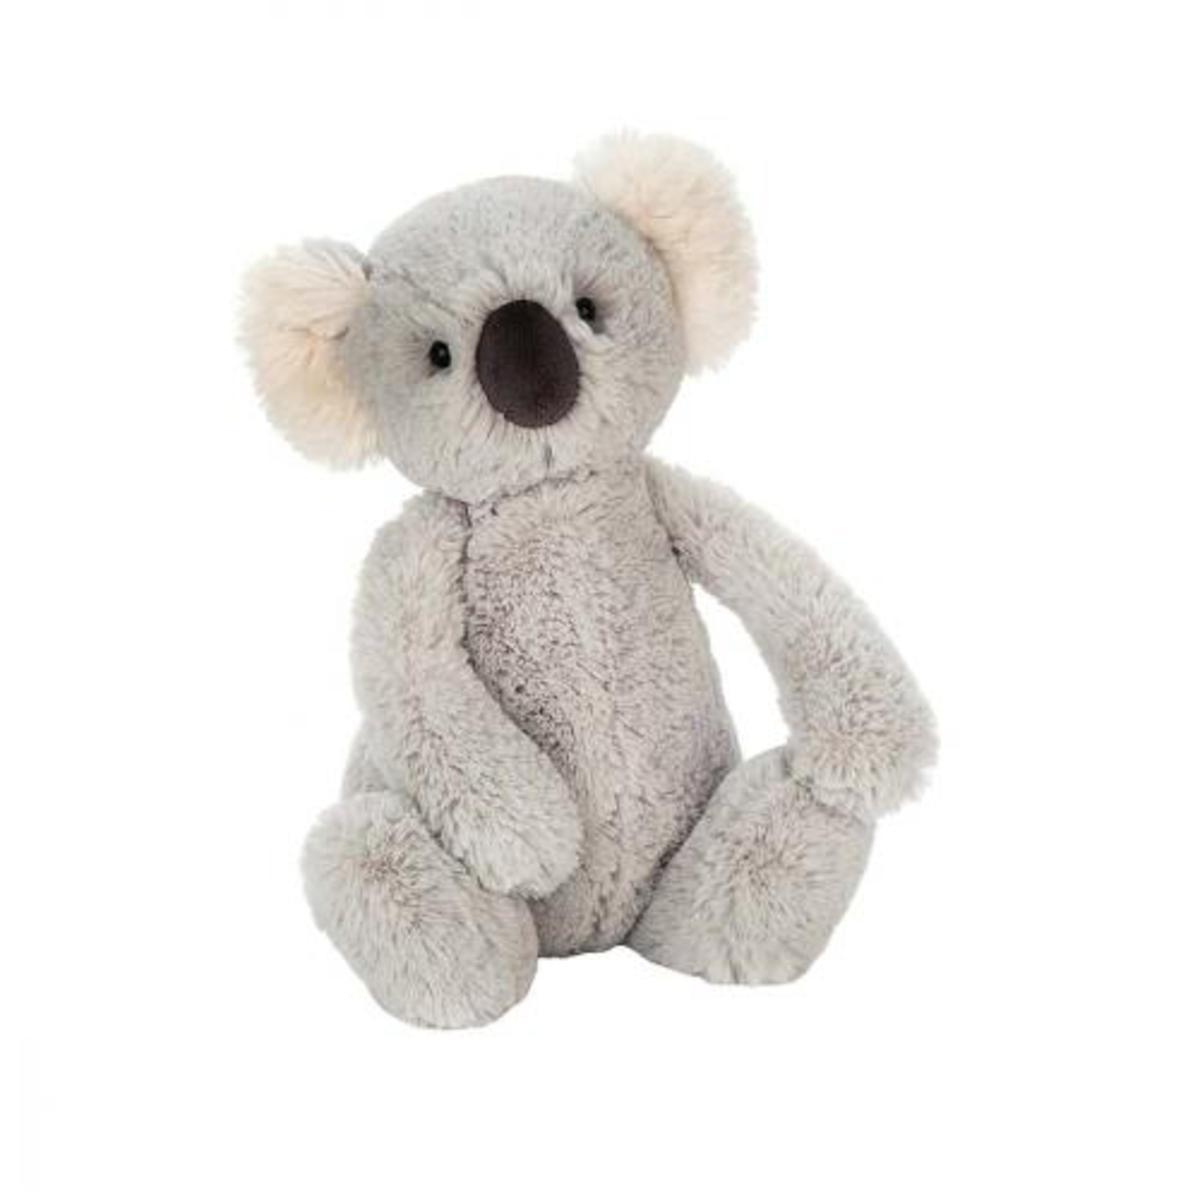 Peluche Bashful Koala - Medium Bashful Koala - Medium